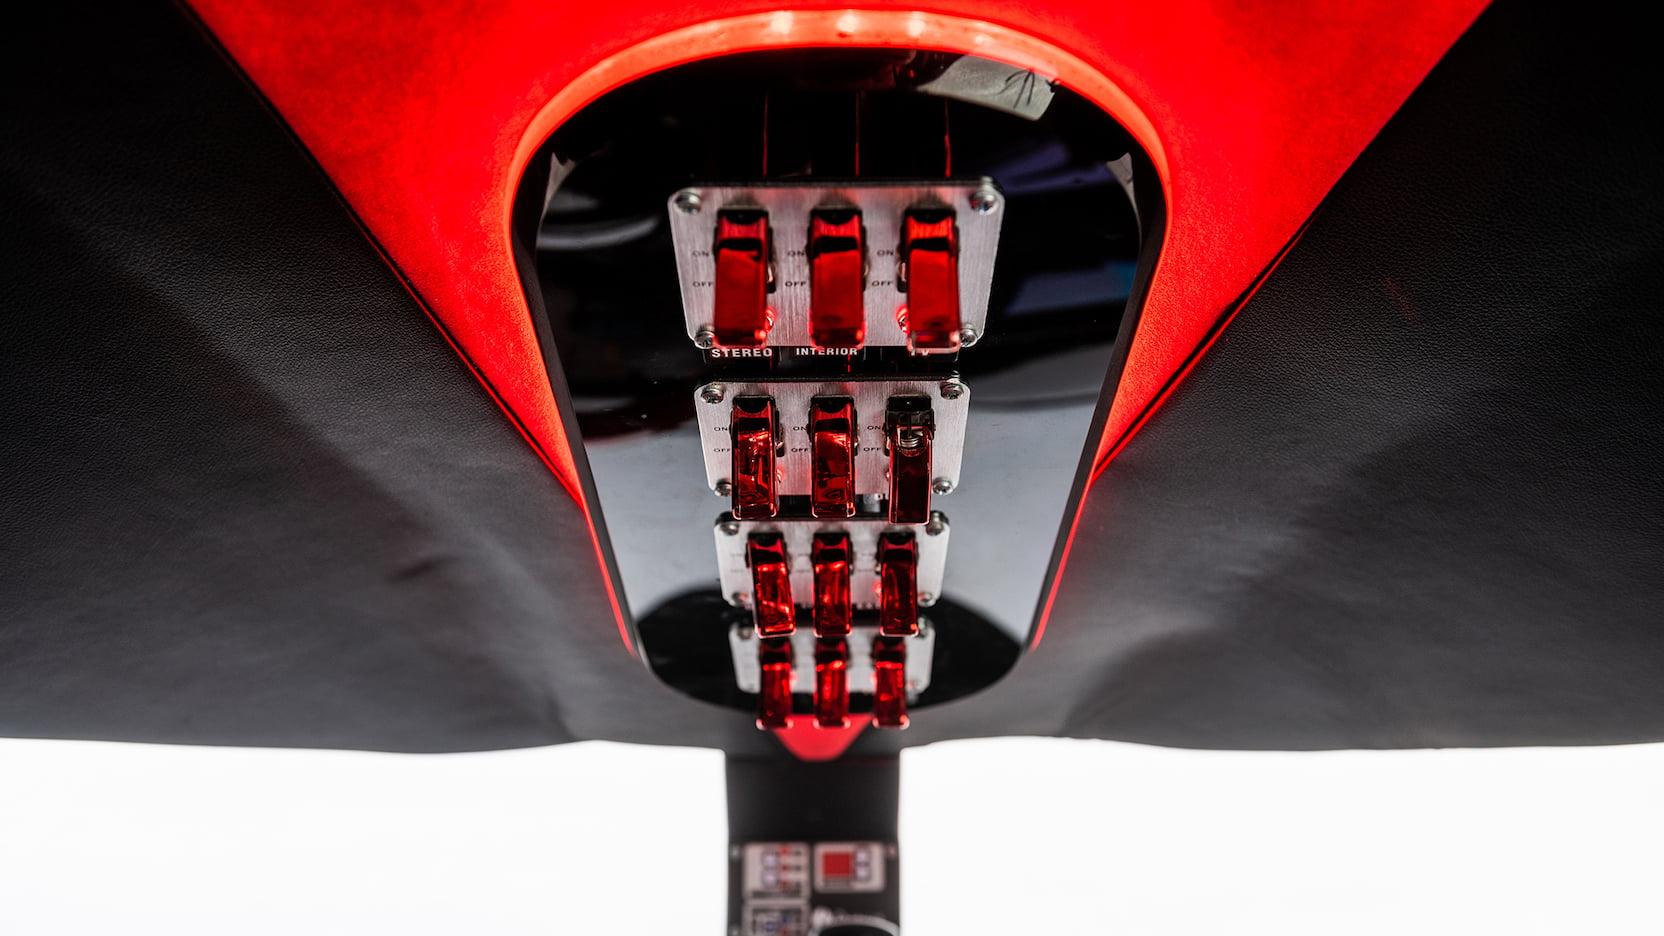 Limo-Jet Lear Jet Limousine driver's overhead control panel